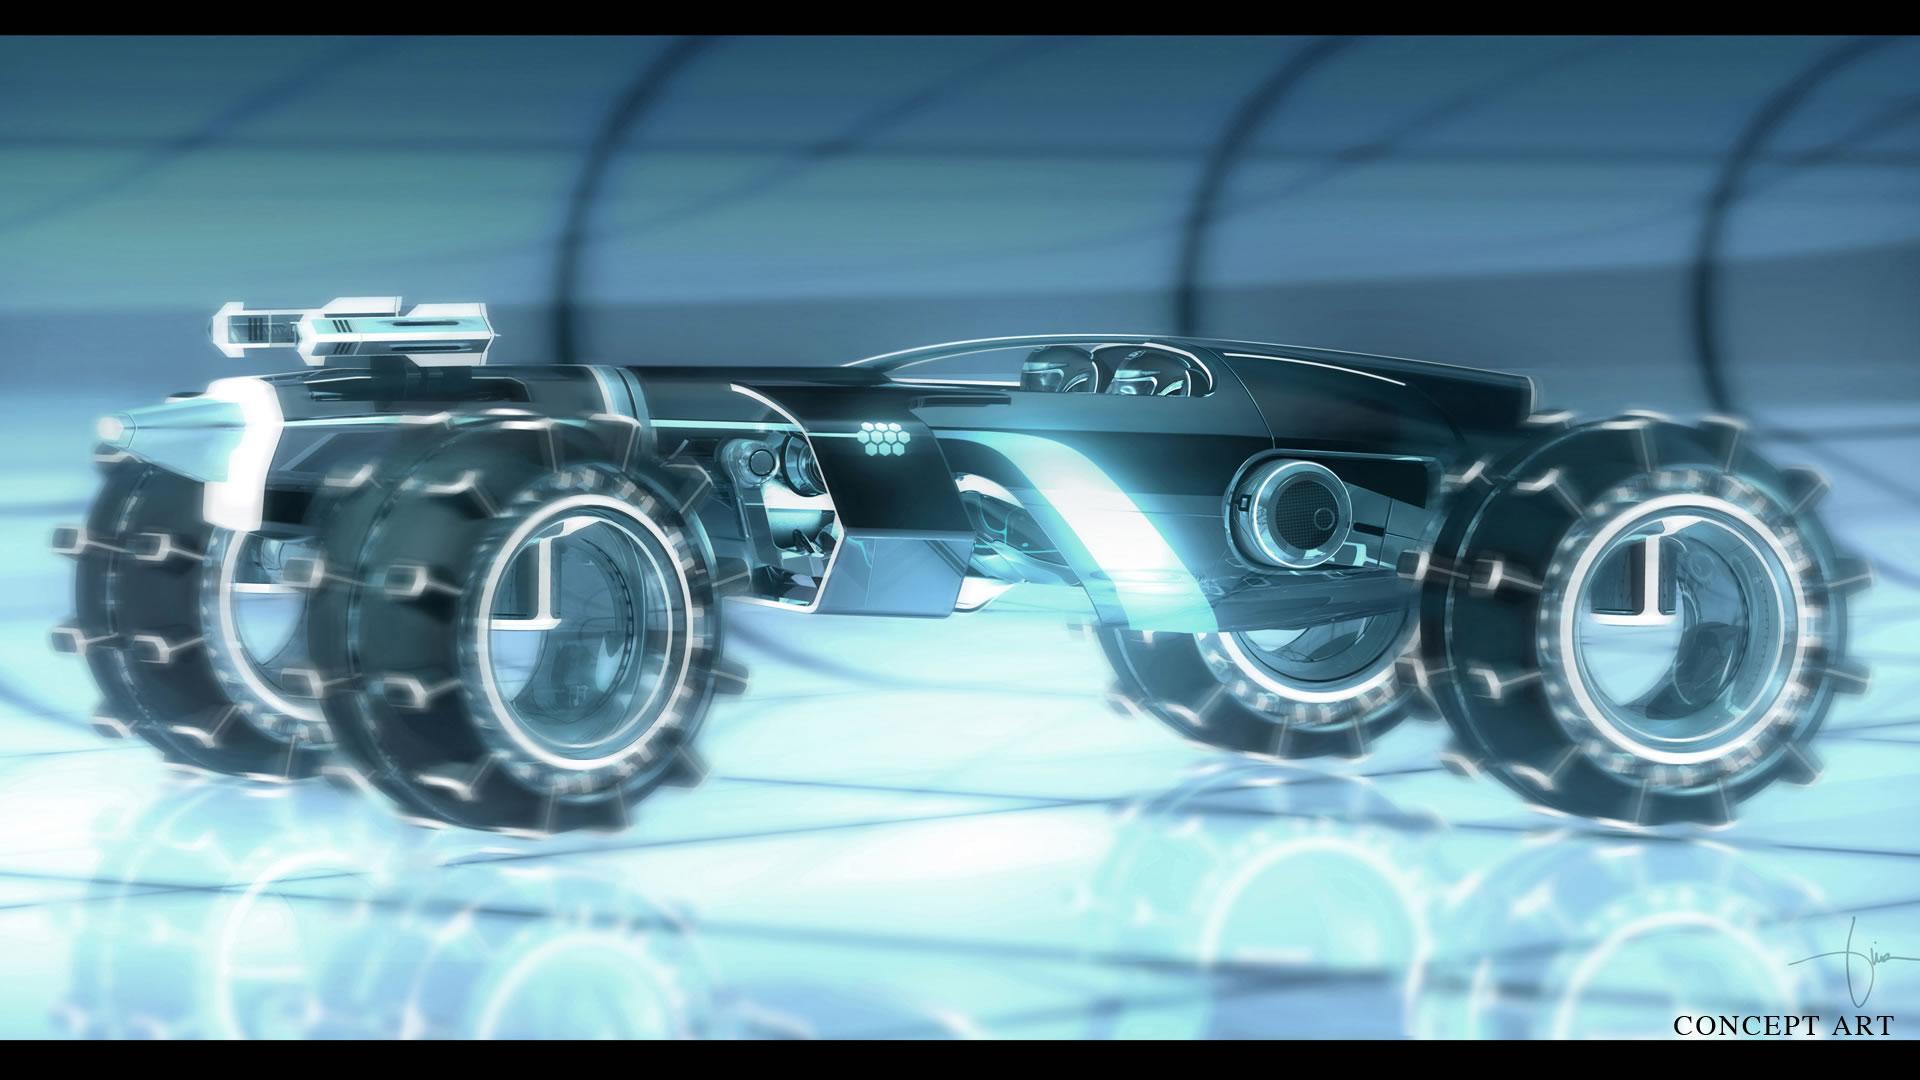 concept-artwork-Tron-Legacy-5.jpg (1920×1080)